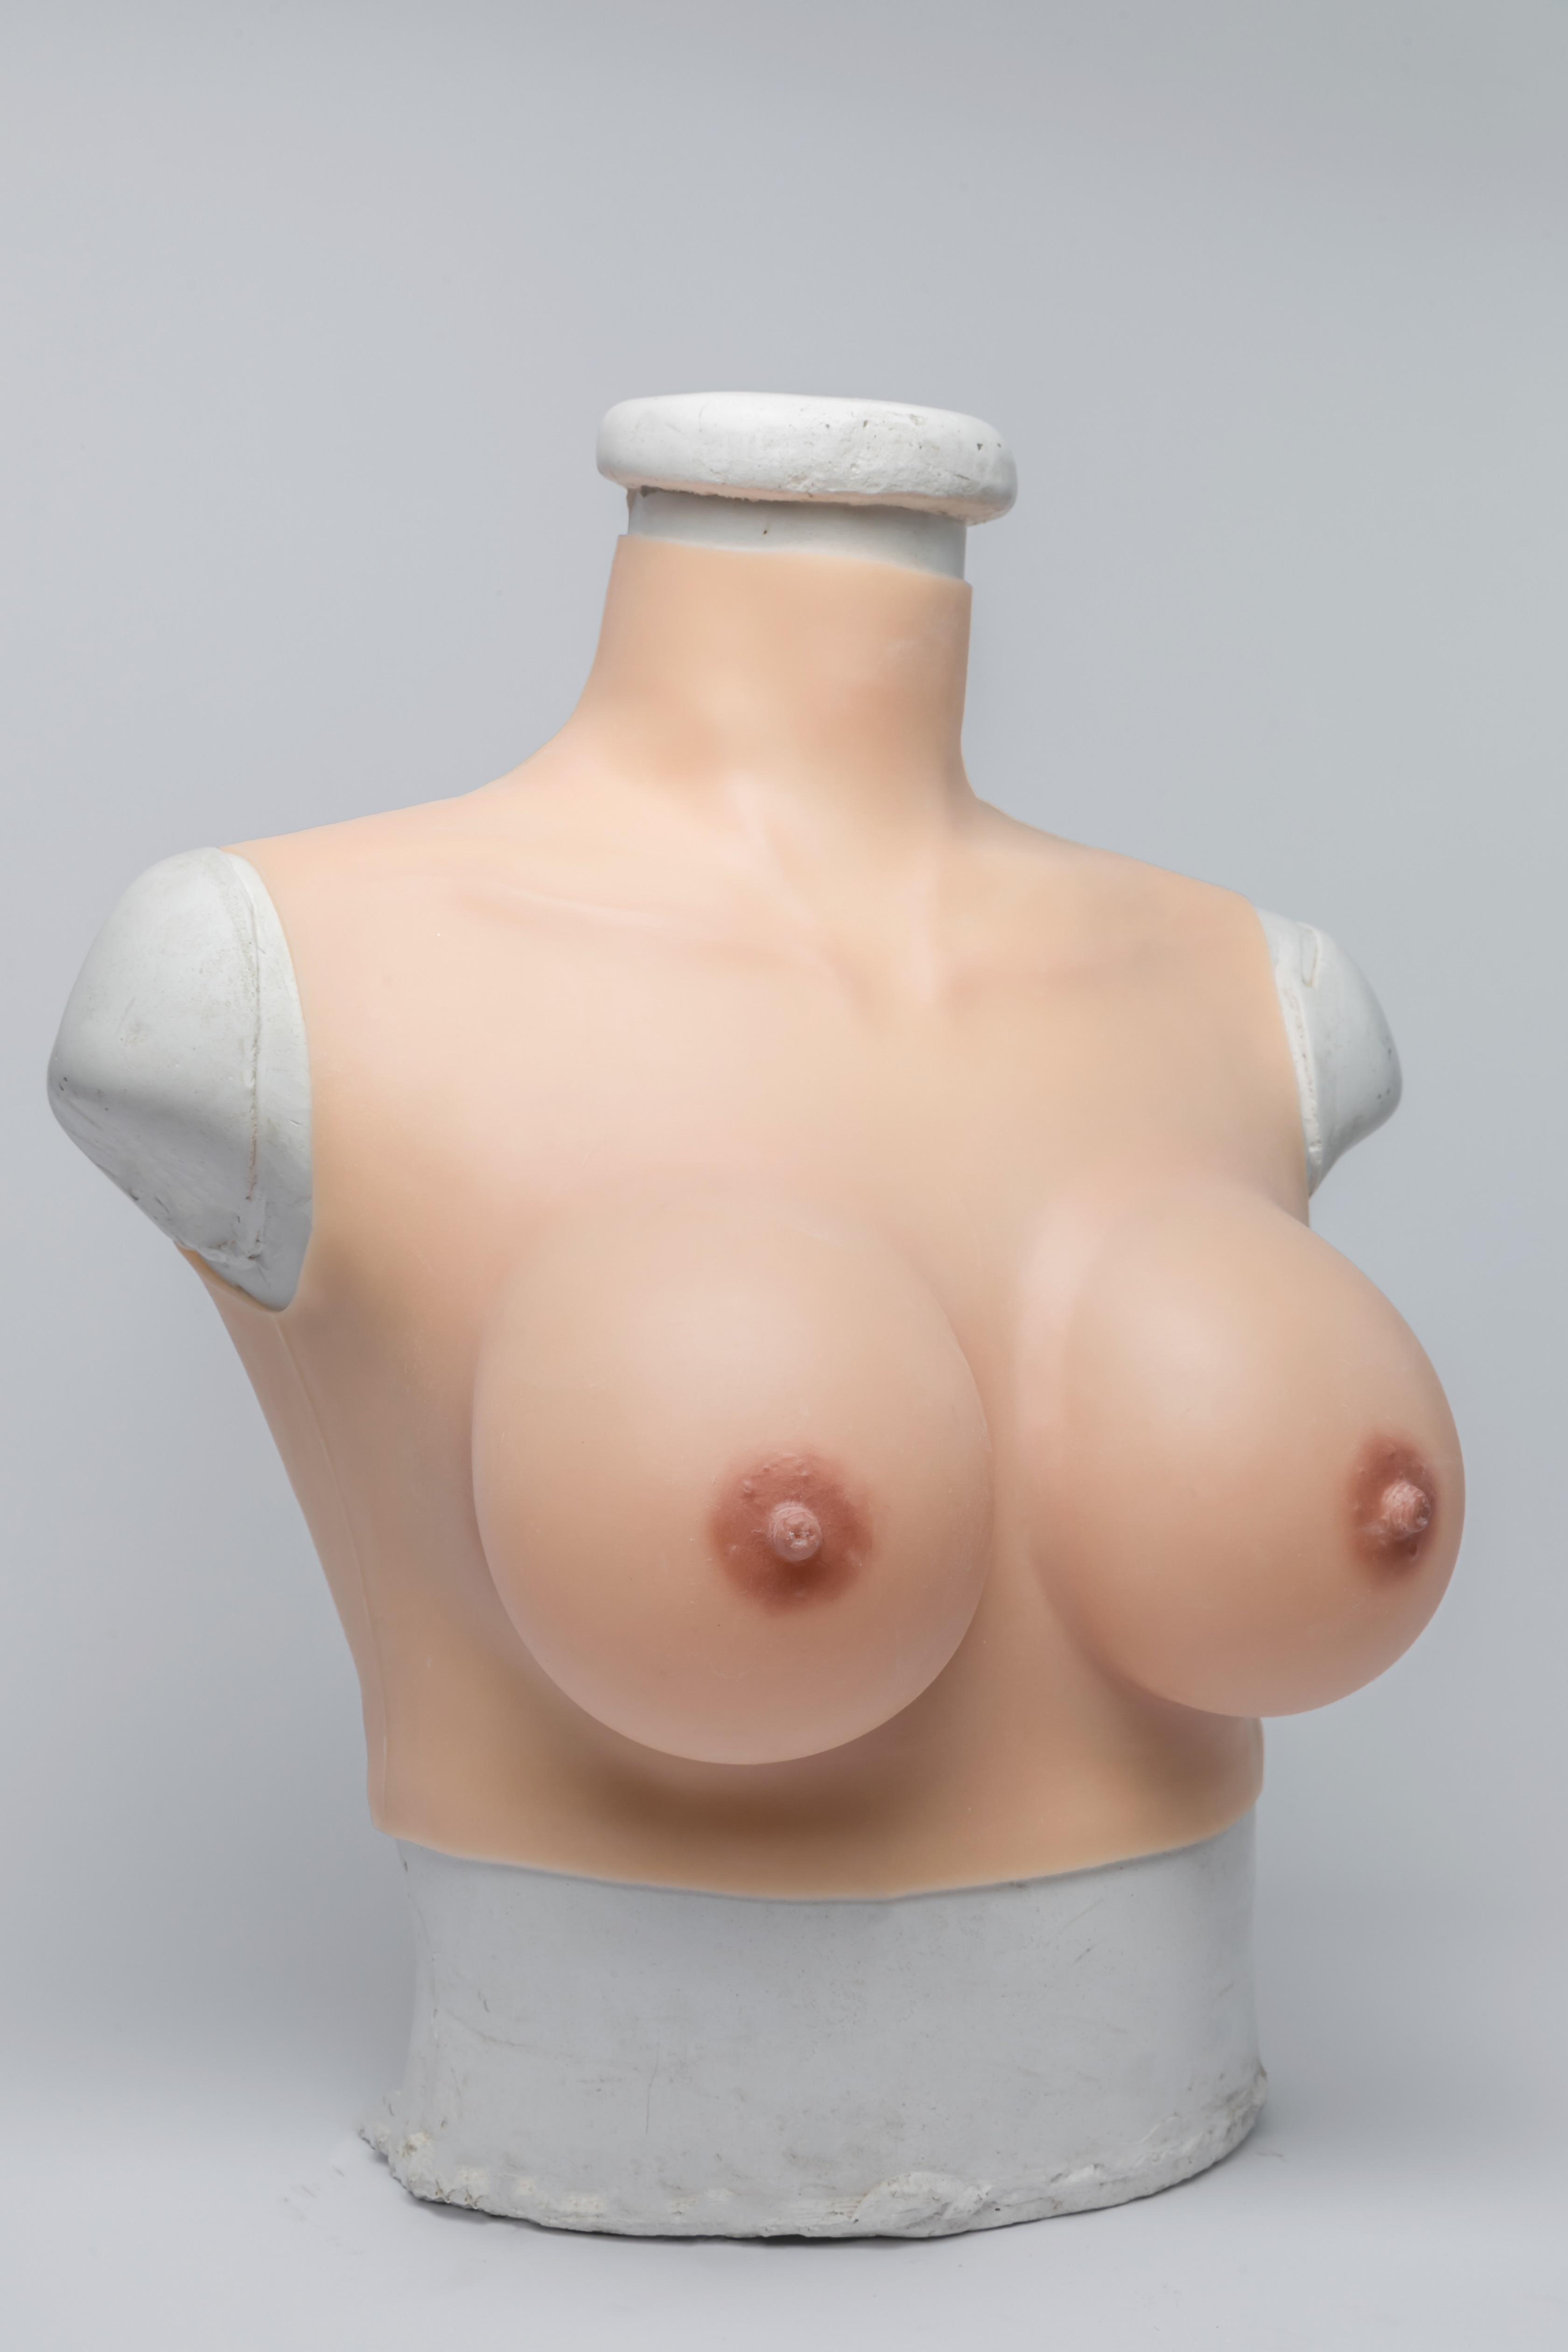 cheap silicone breast plate Cross-dresser